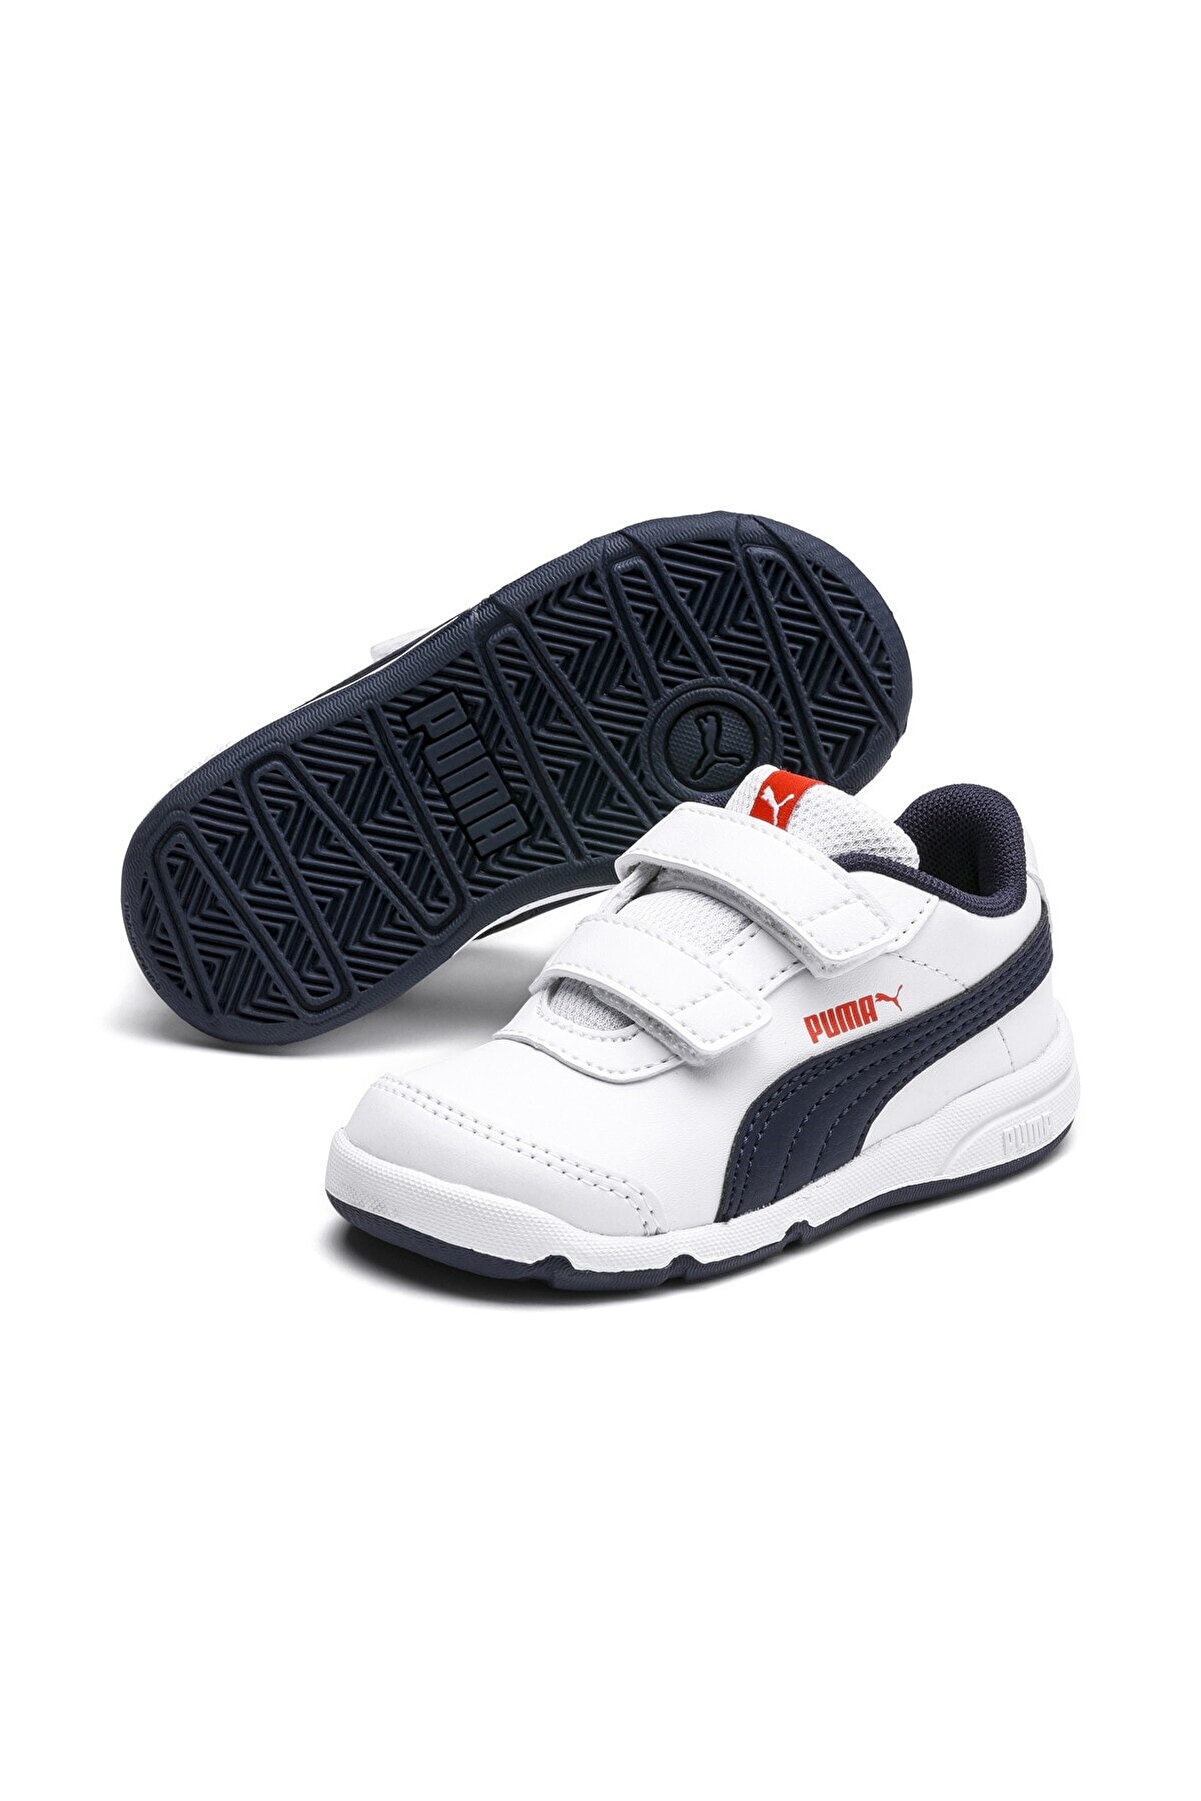 Puma Unisex Sneaker - STEPFLEEX 2 SL VE V - 19252307